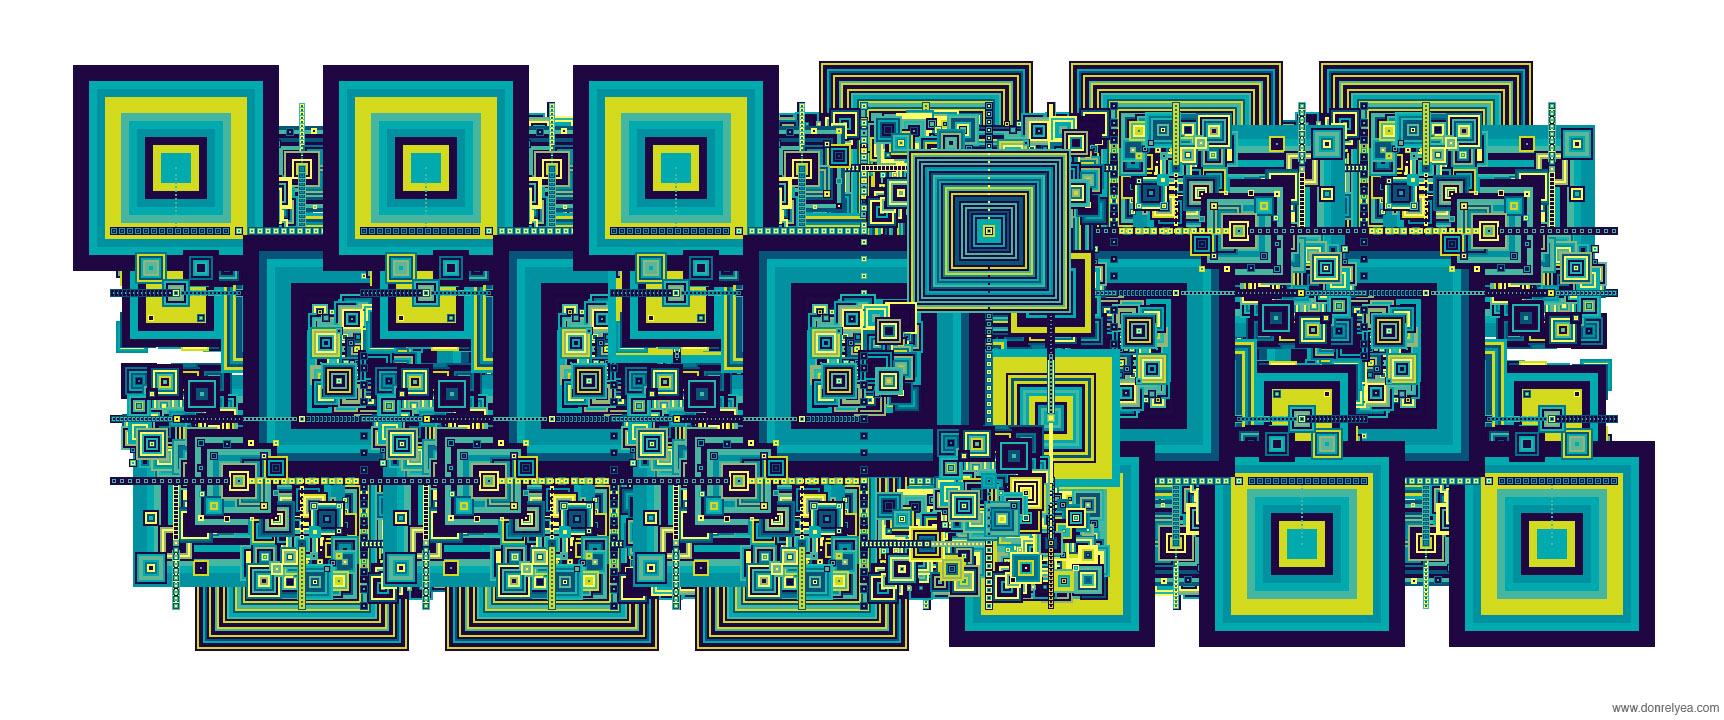 30589_99828978 generative algorithmic artwork  By Don Relyea